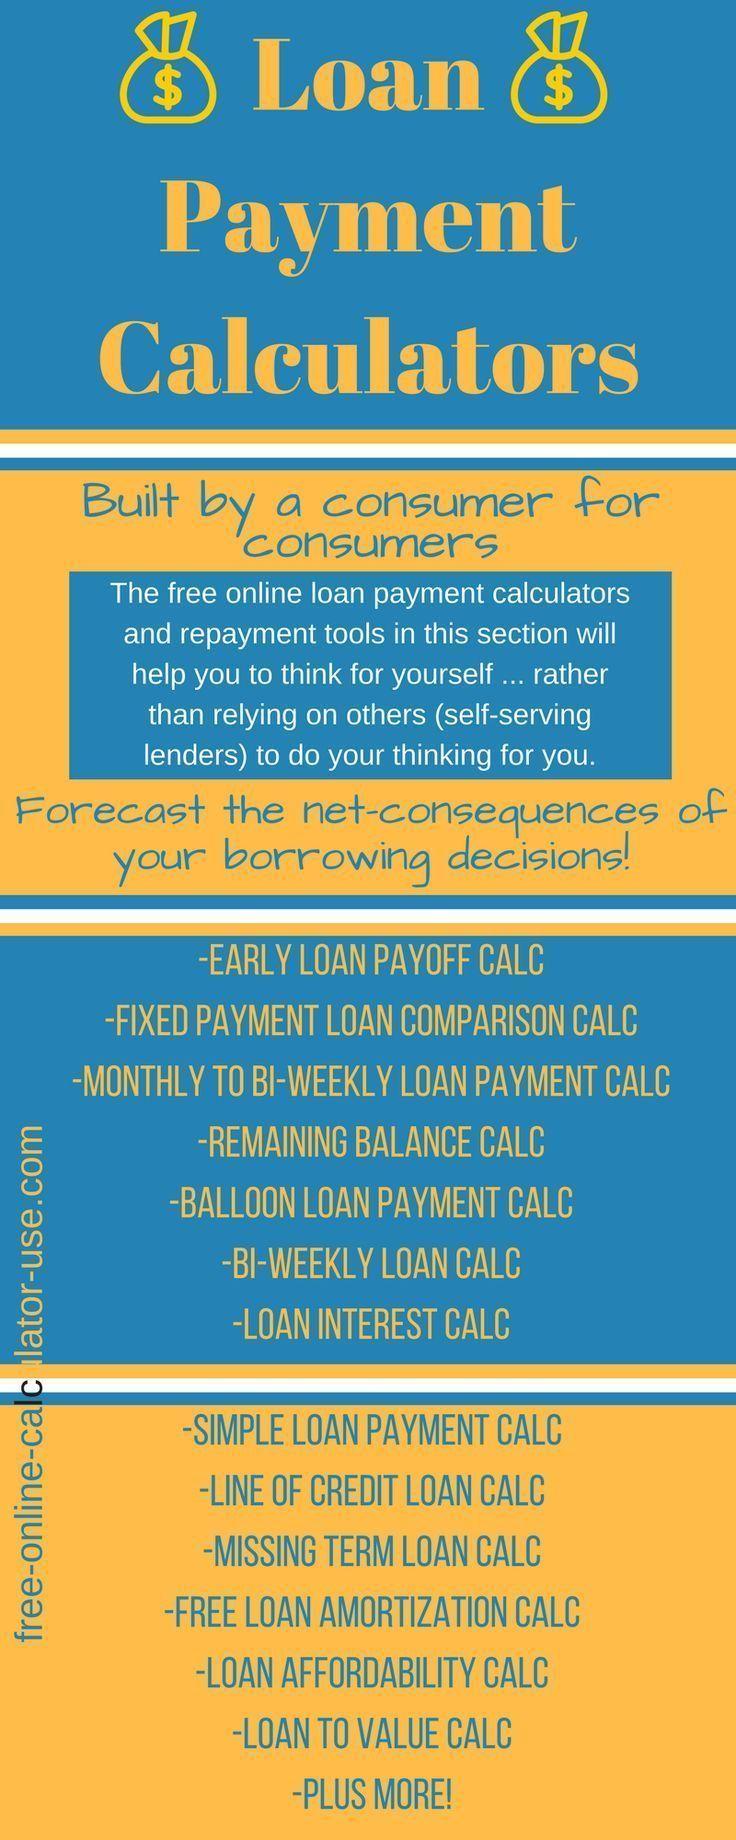 Loan Payment Calculators Reveal Hidden Consequences House Loan Payment Calcula House Paym Student Loans Funny Mortgage Repayment Calculator Graduation Funny Loan amortization calculator with balloon